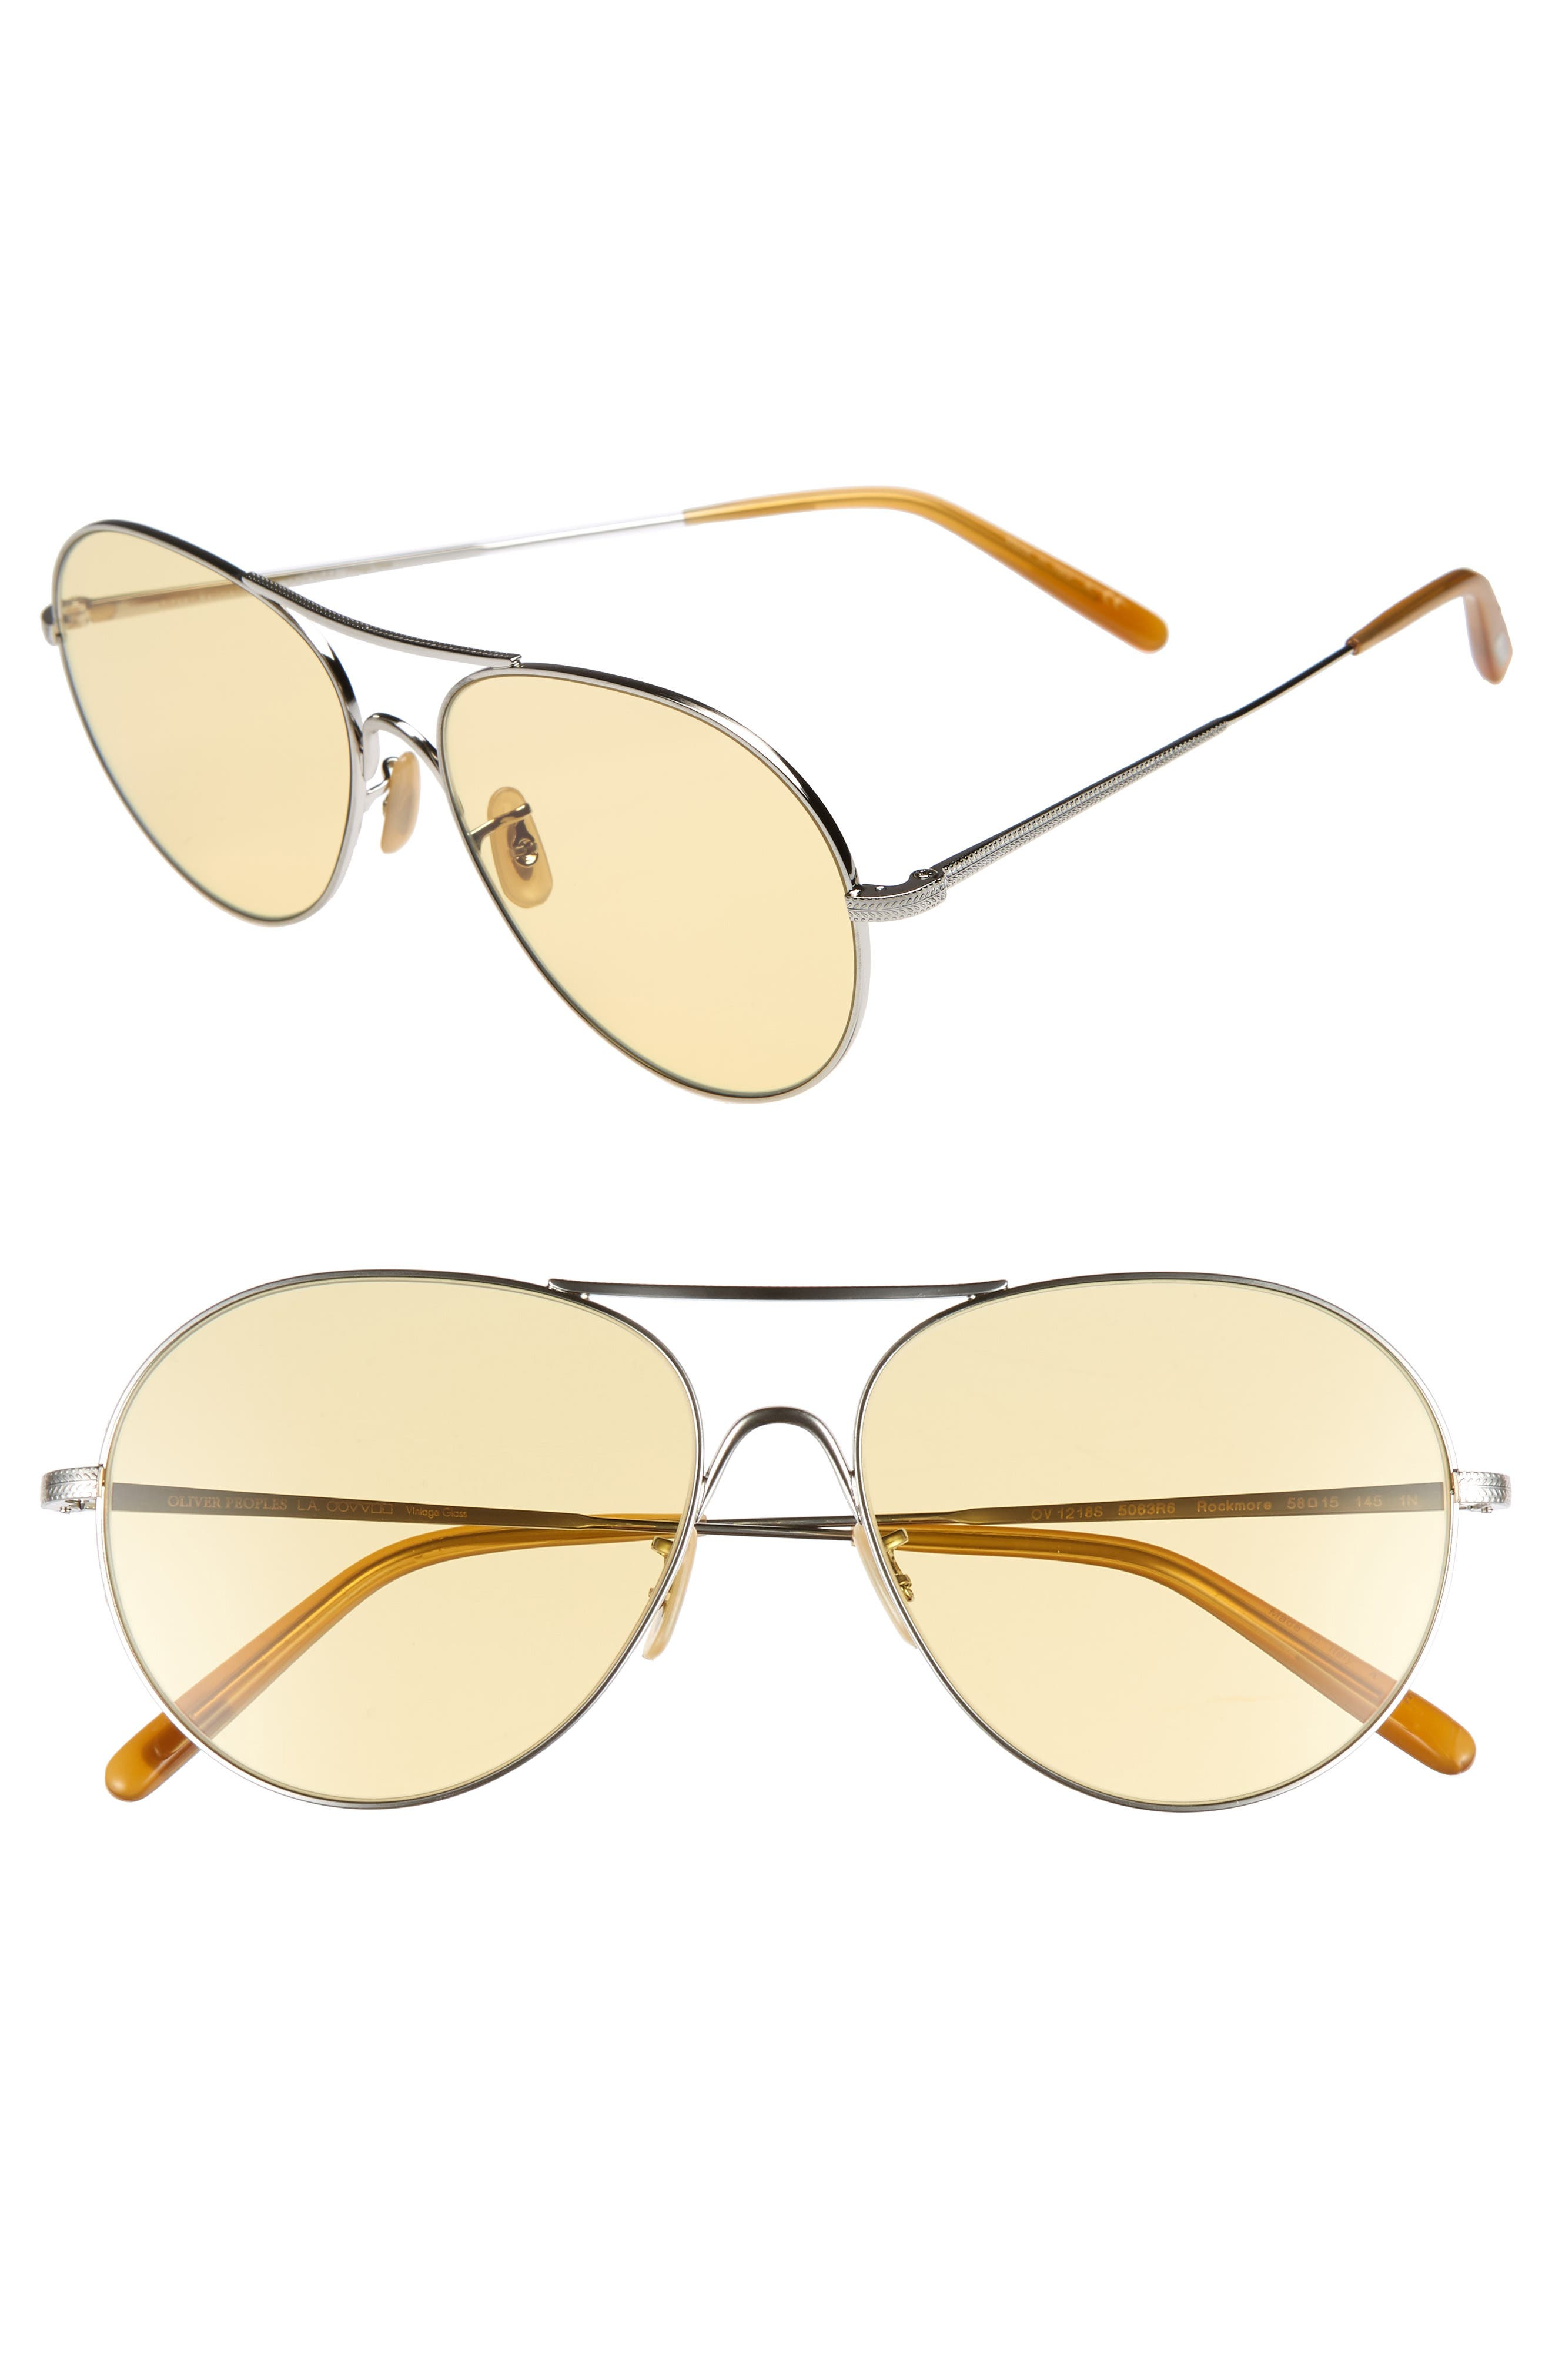 Rockmore 58mm Aviator Sunglasses,                             Main thumbnail 1, color,                             SILVER